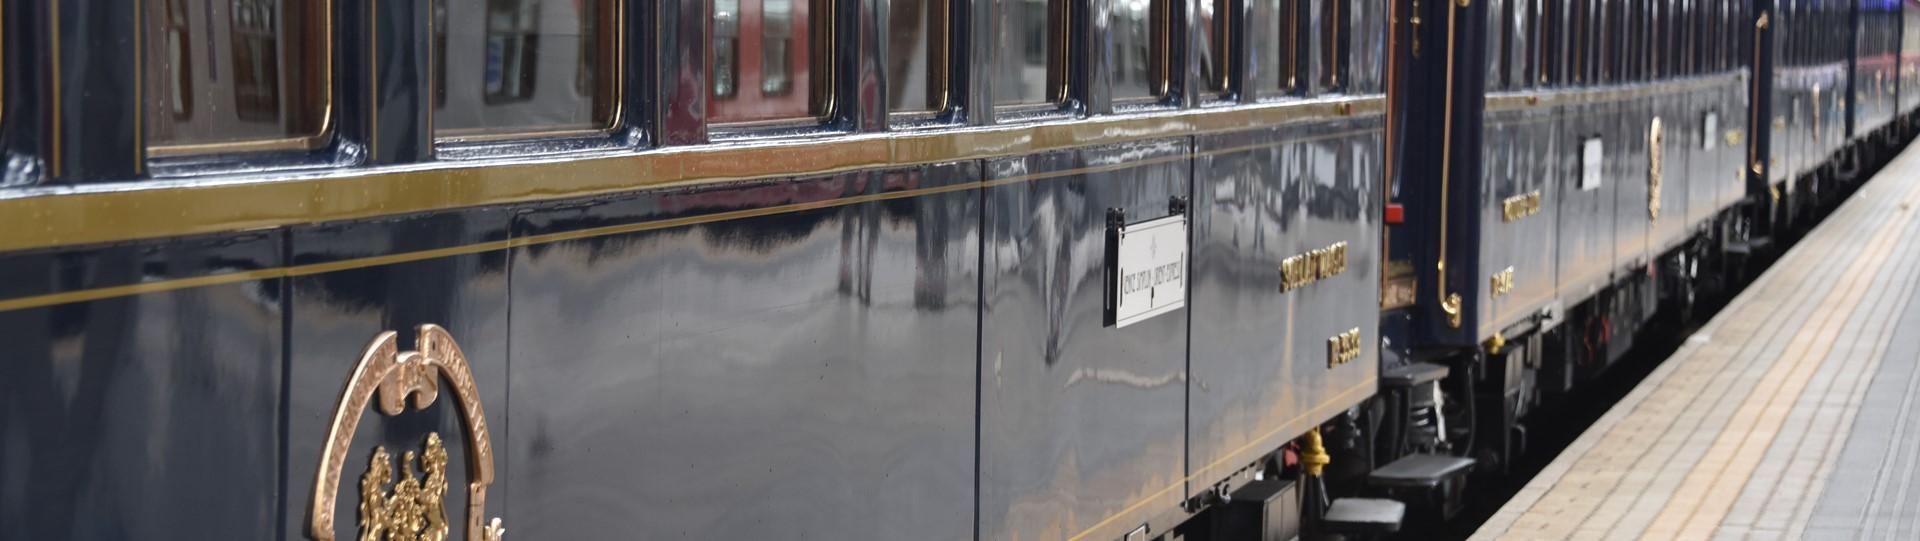 De Venice Simplon Orient Express